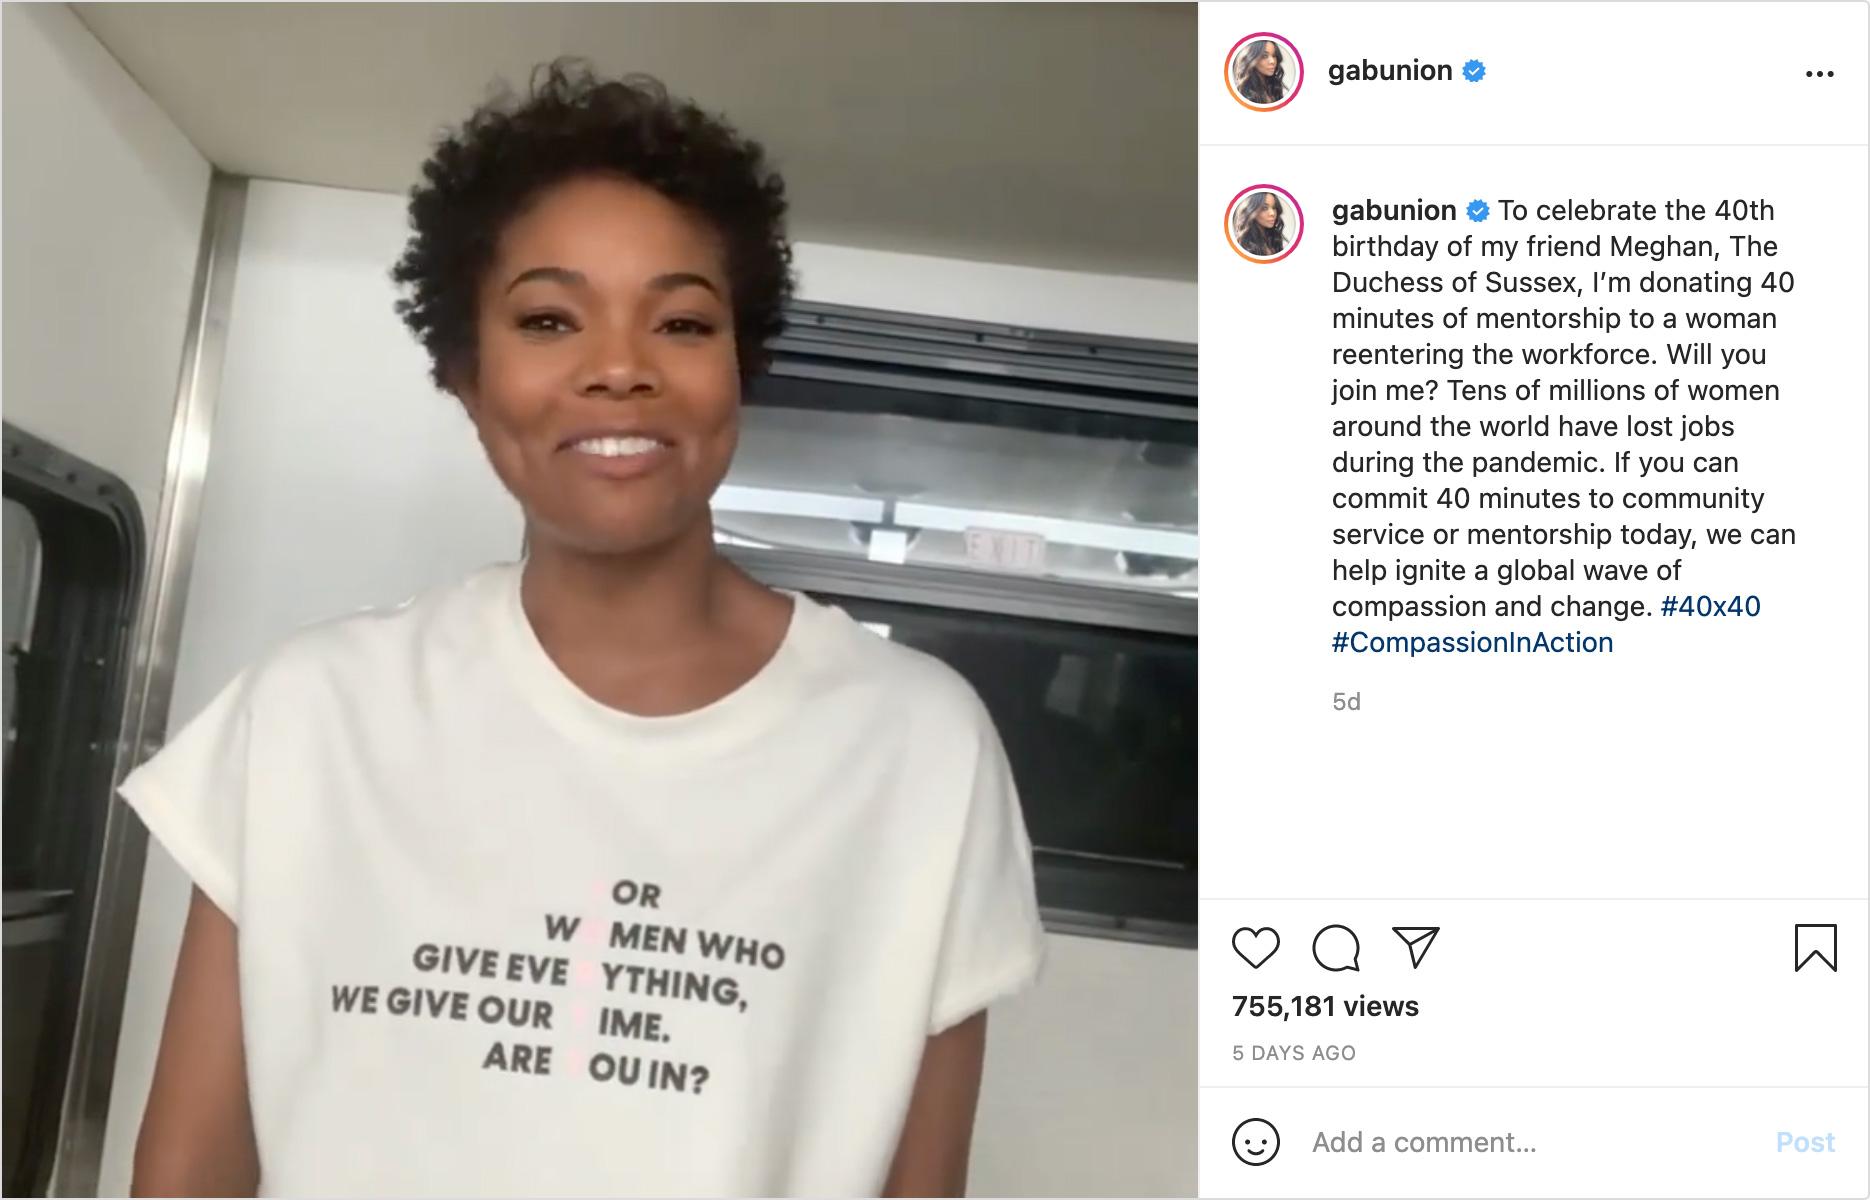 Gabrielle Union social media post